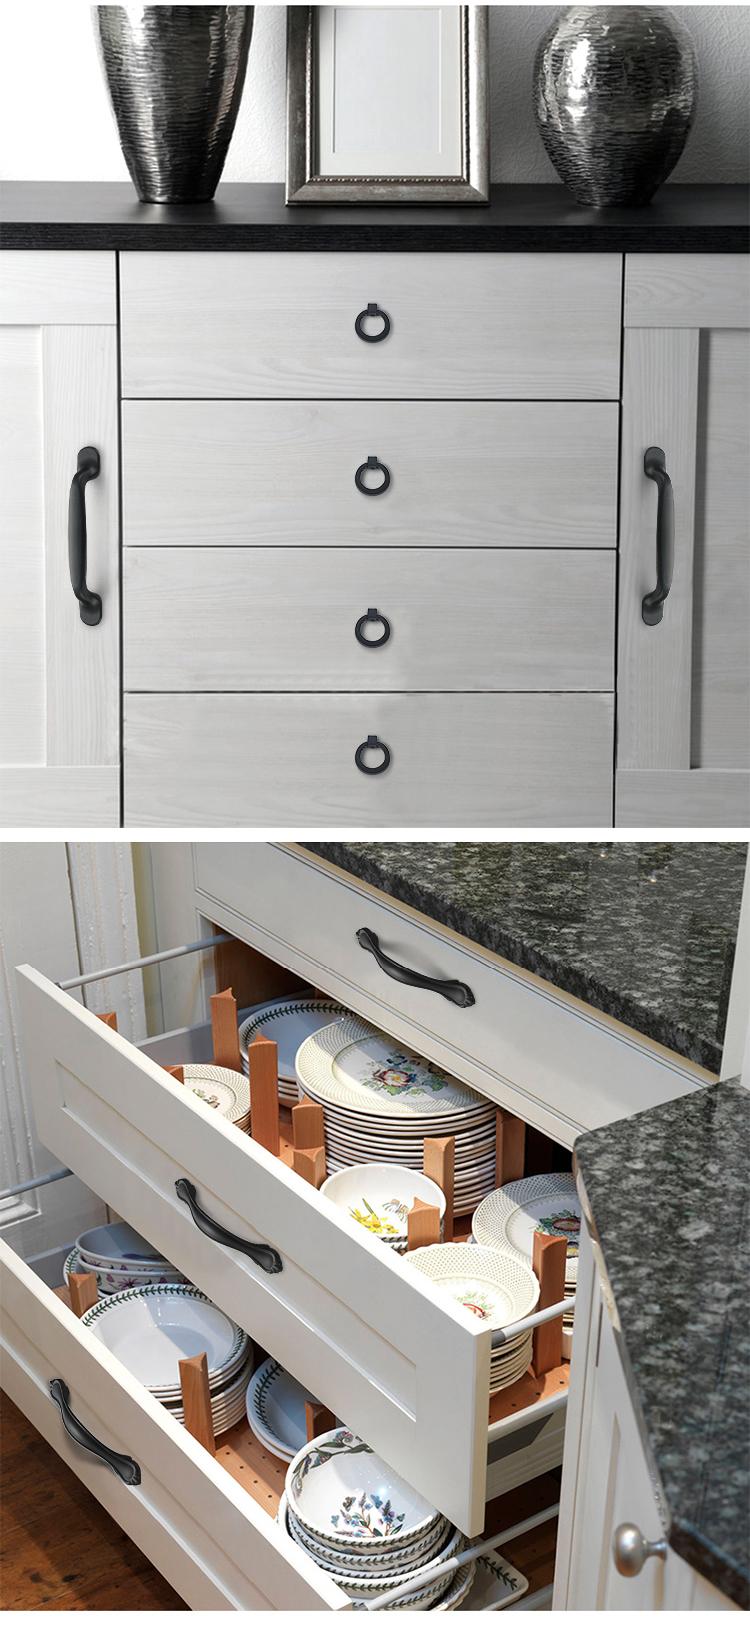 H416a01fa0db4476dbcb9ad9adb5b9b9d1 - American Style Black Cabinet Handles Solid Aluminum Alloy Kitchen Cupboard Pulls Drawer Knobs Furniture Handle Hardware